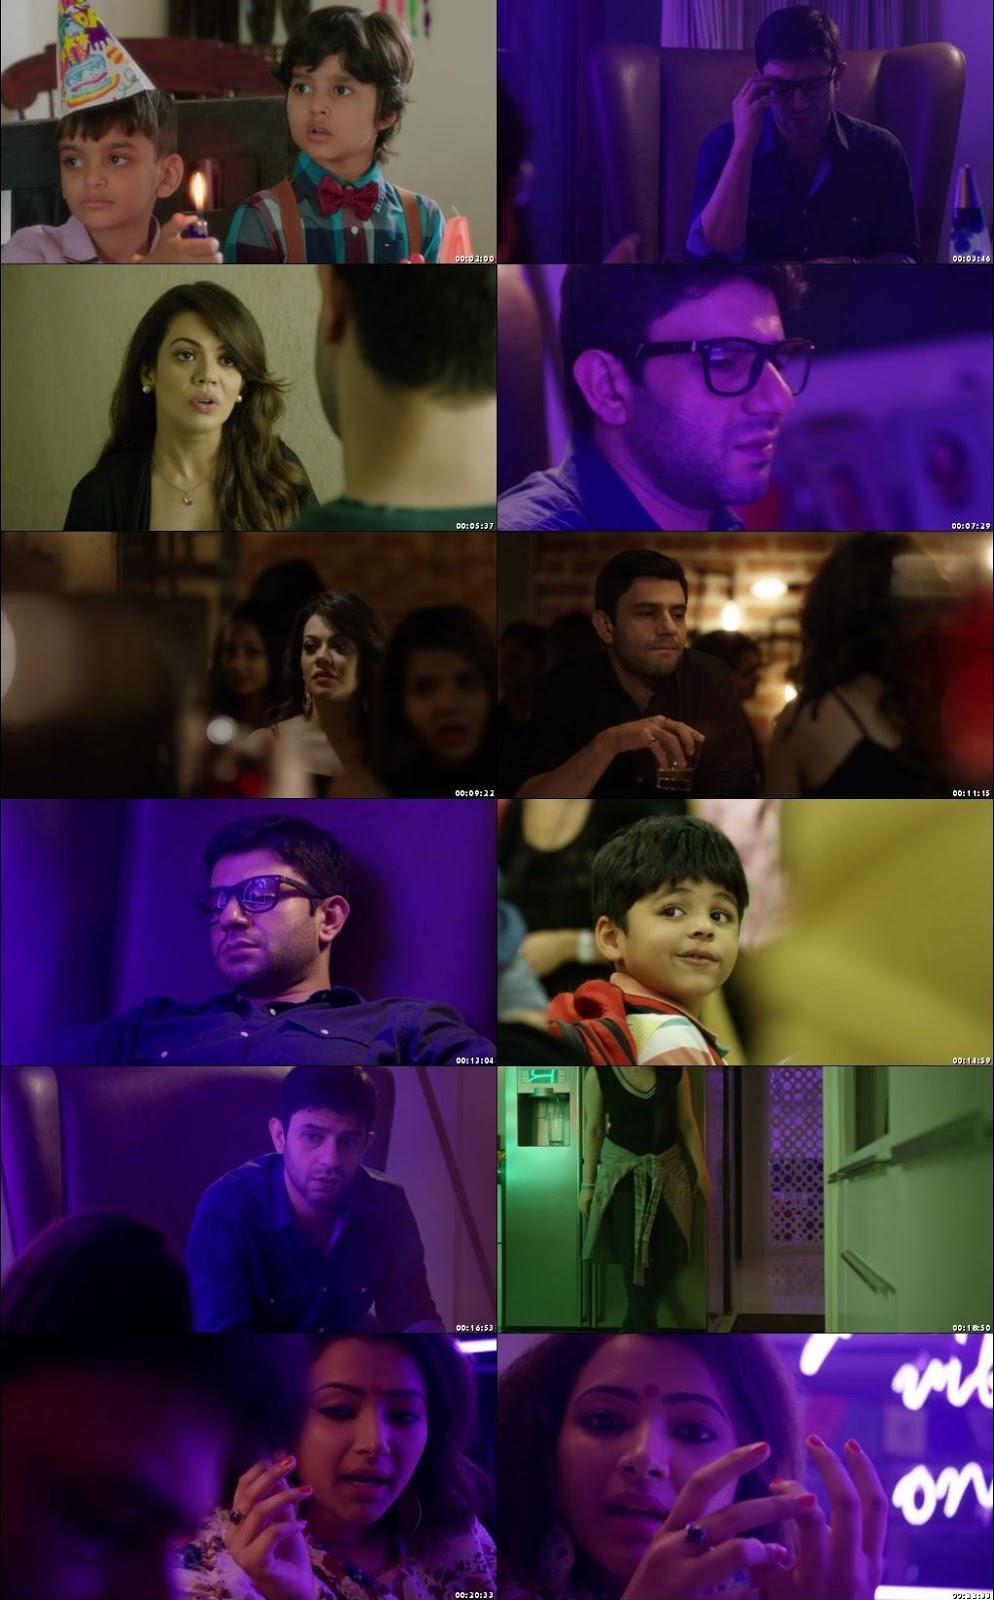 Flip 2019 S01 Complete Full Hindi Episode Online Watch